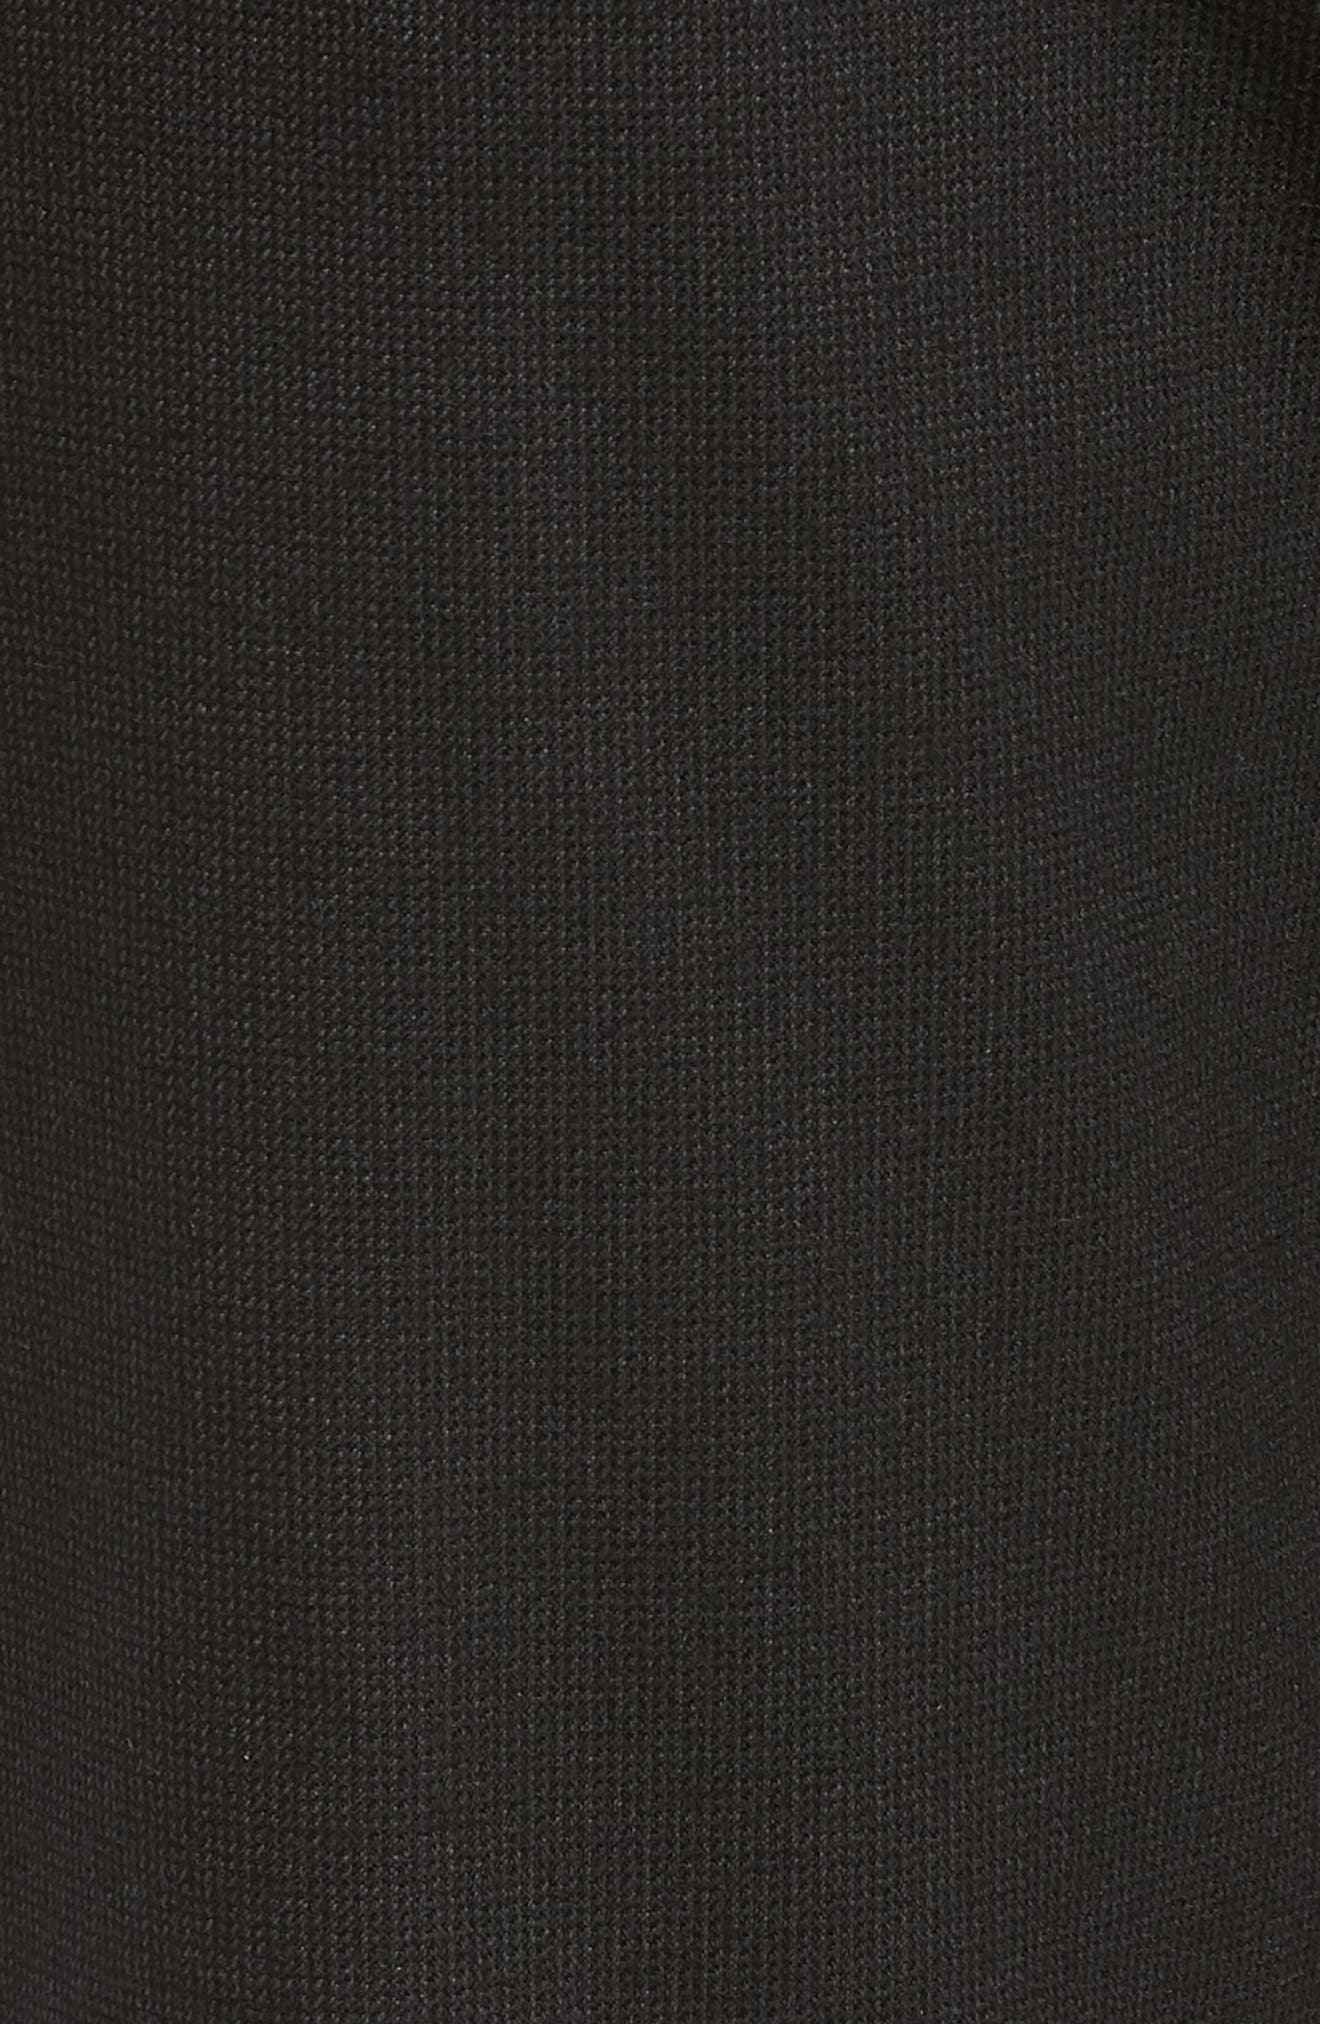 Slim Fit Herringbone Stretch Chinos,                             Alternate thumbnail 5, color,                             021